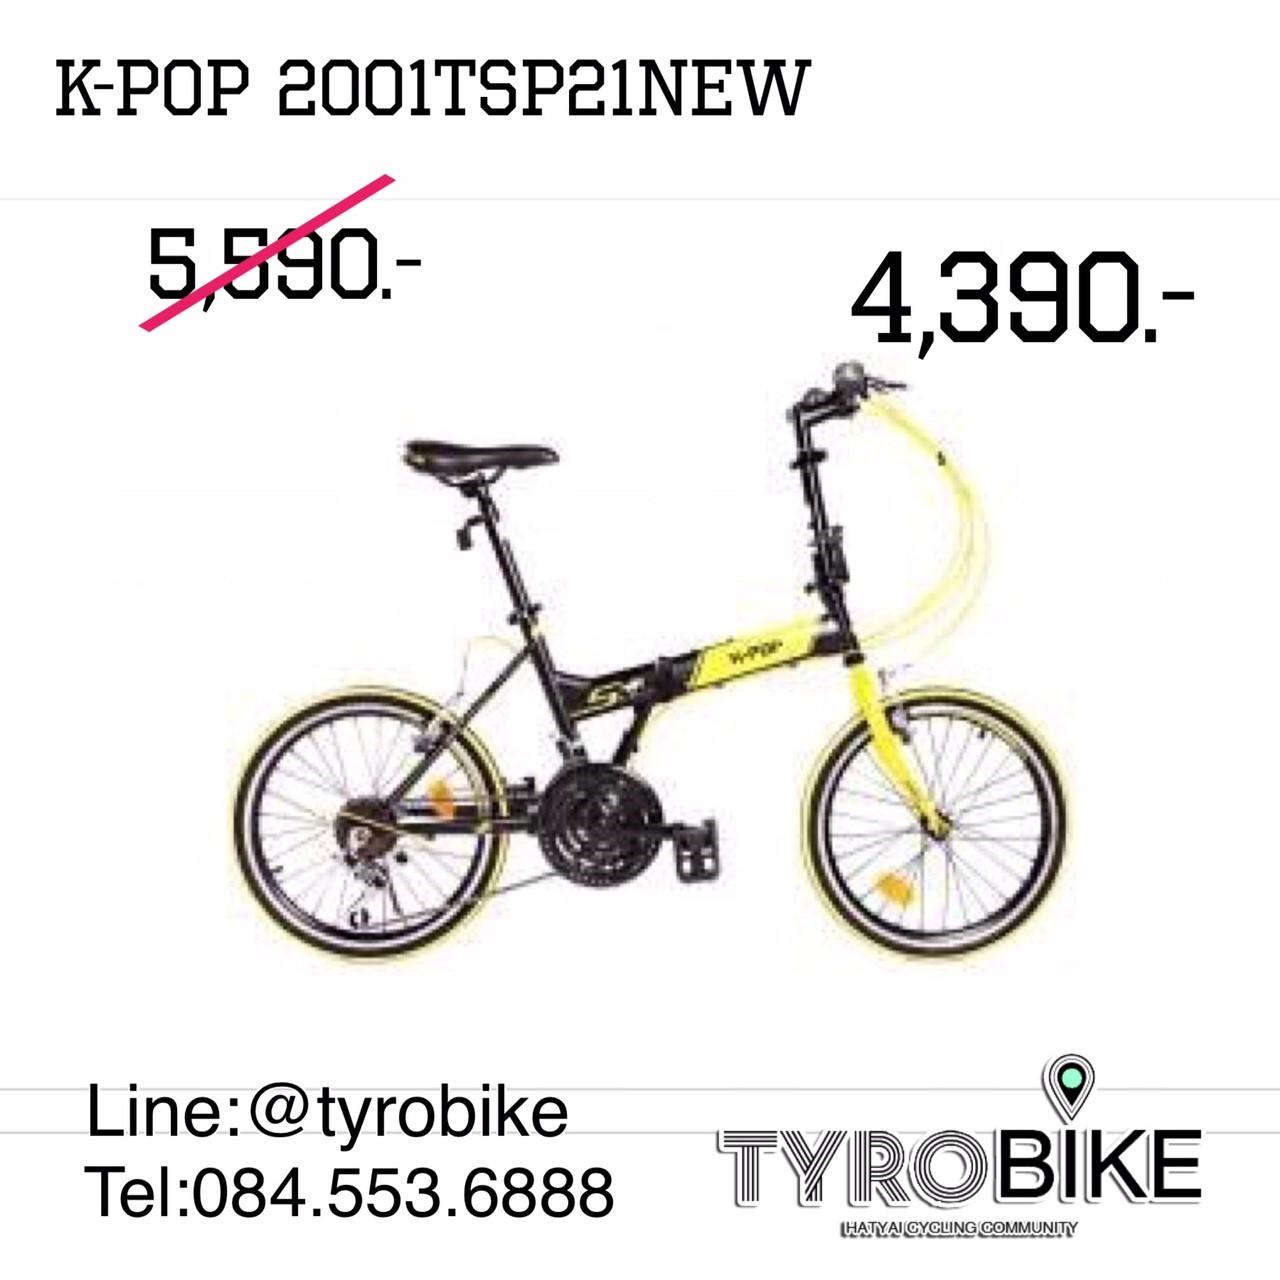 K-POP 2001 New